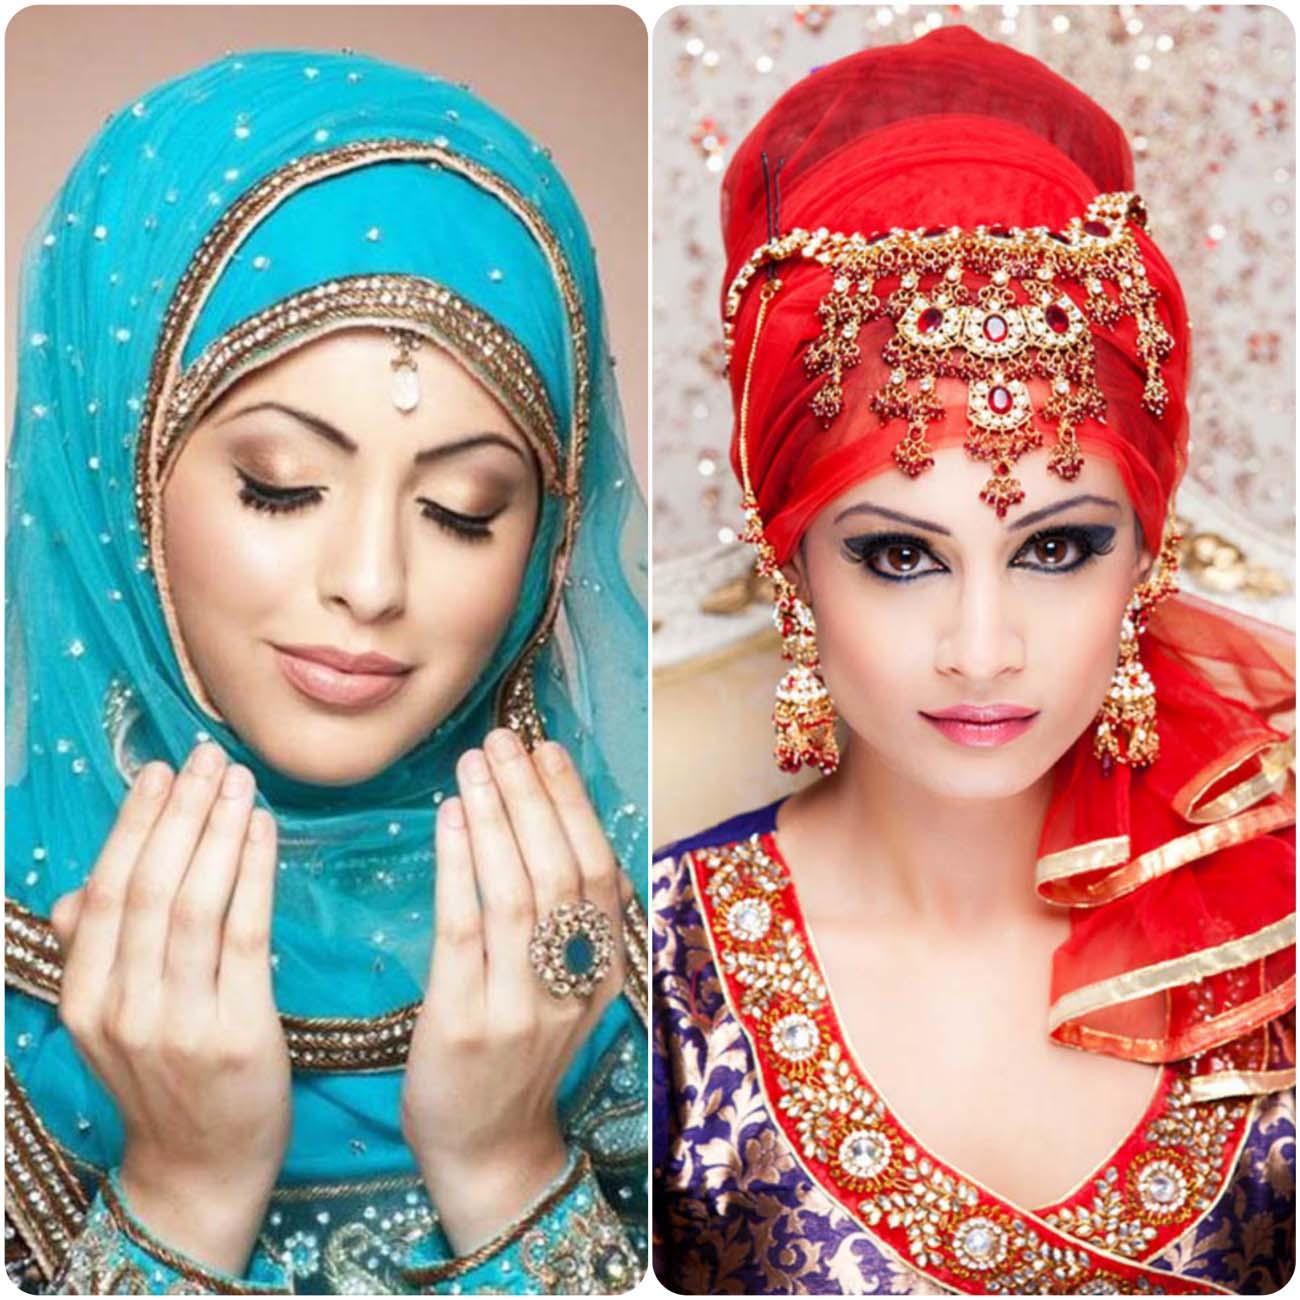 Designers Abaya Dresses Designs For Wedding Bridals 2016-2017...styloplanet (22)